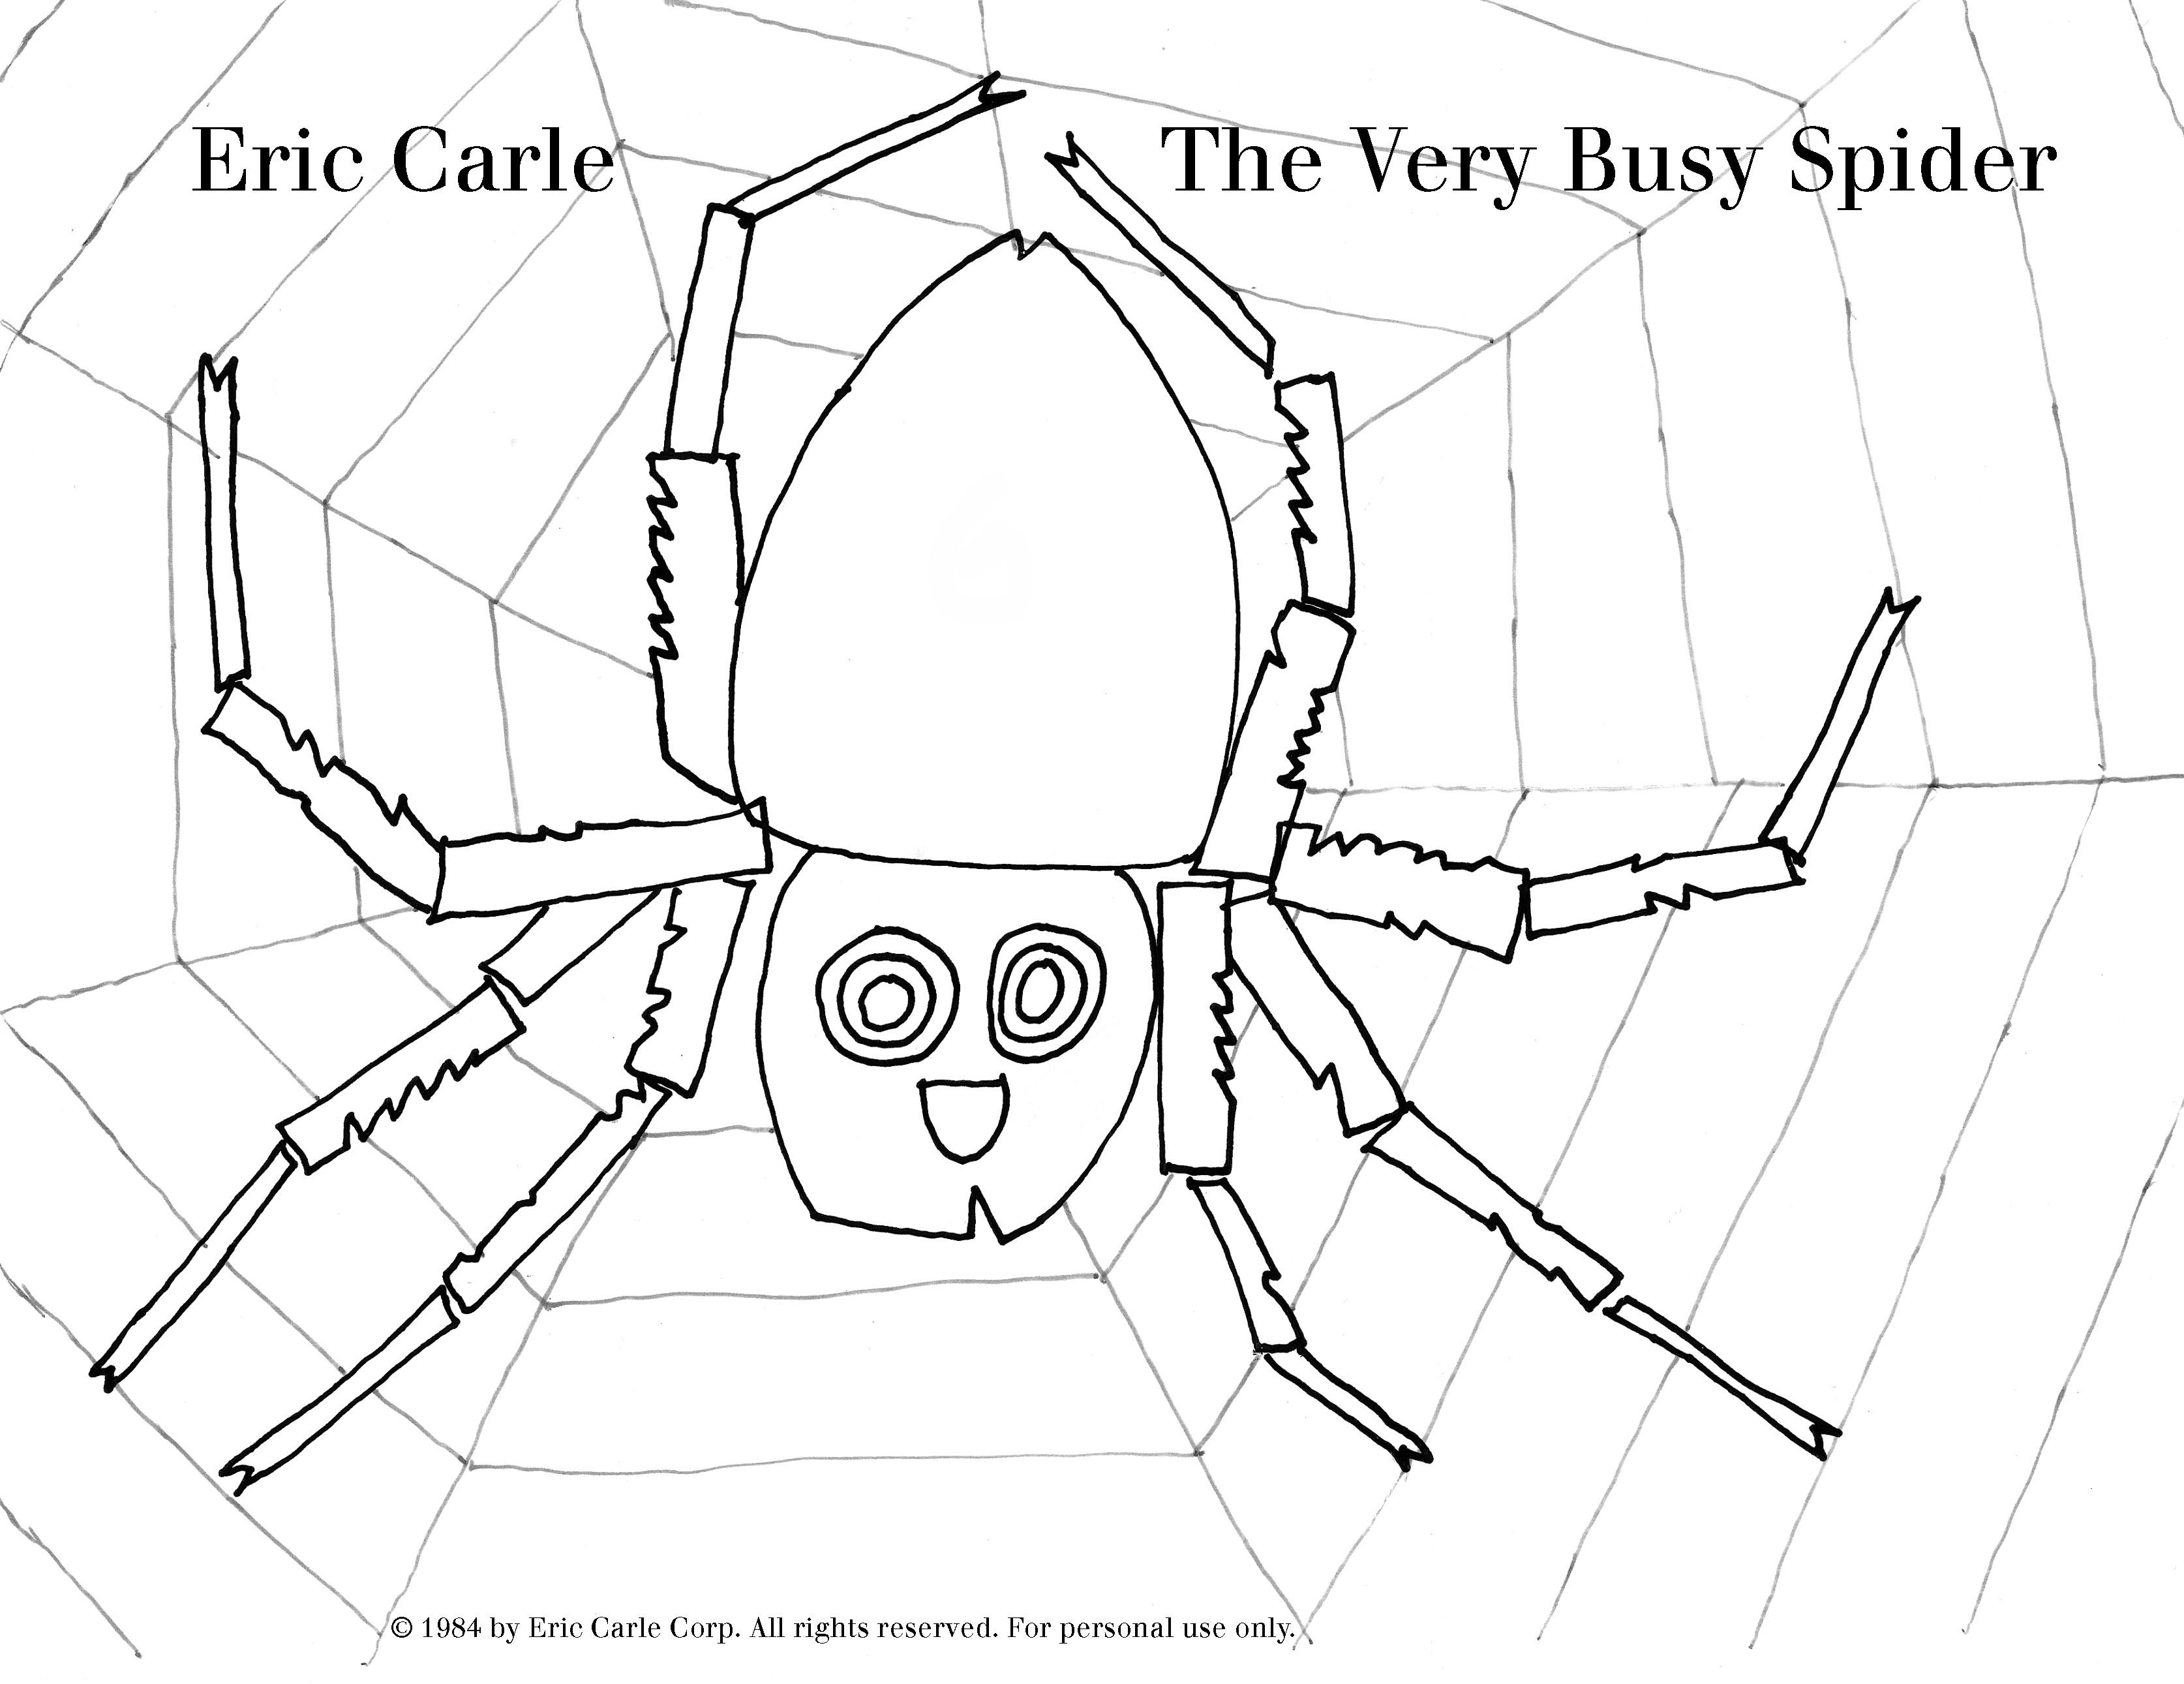 3348x2581 Spider Web Coloring Pages Unique The Ficial Eric Carle Web Site